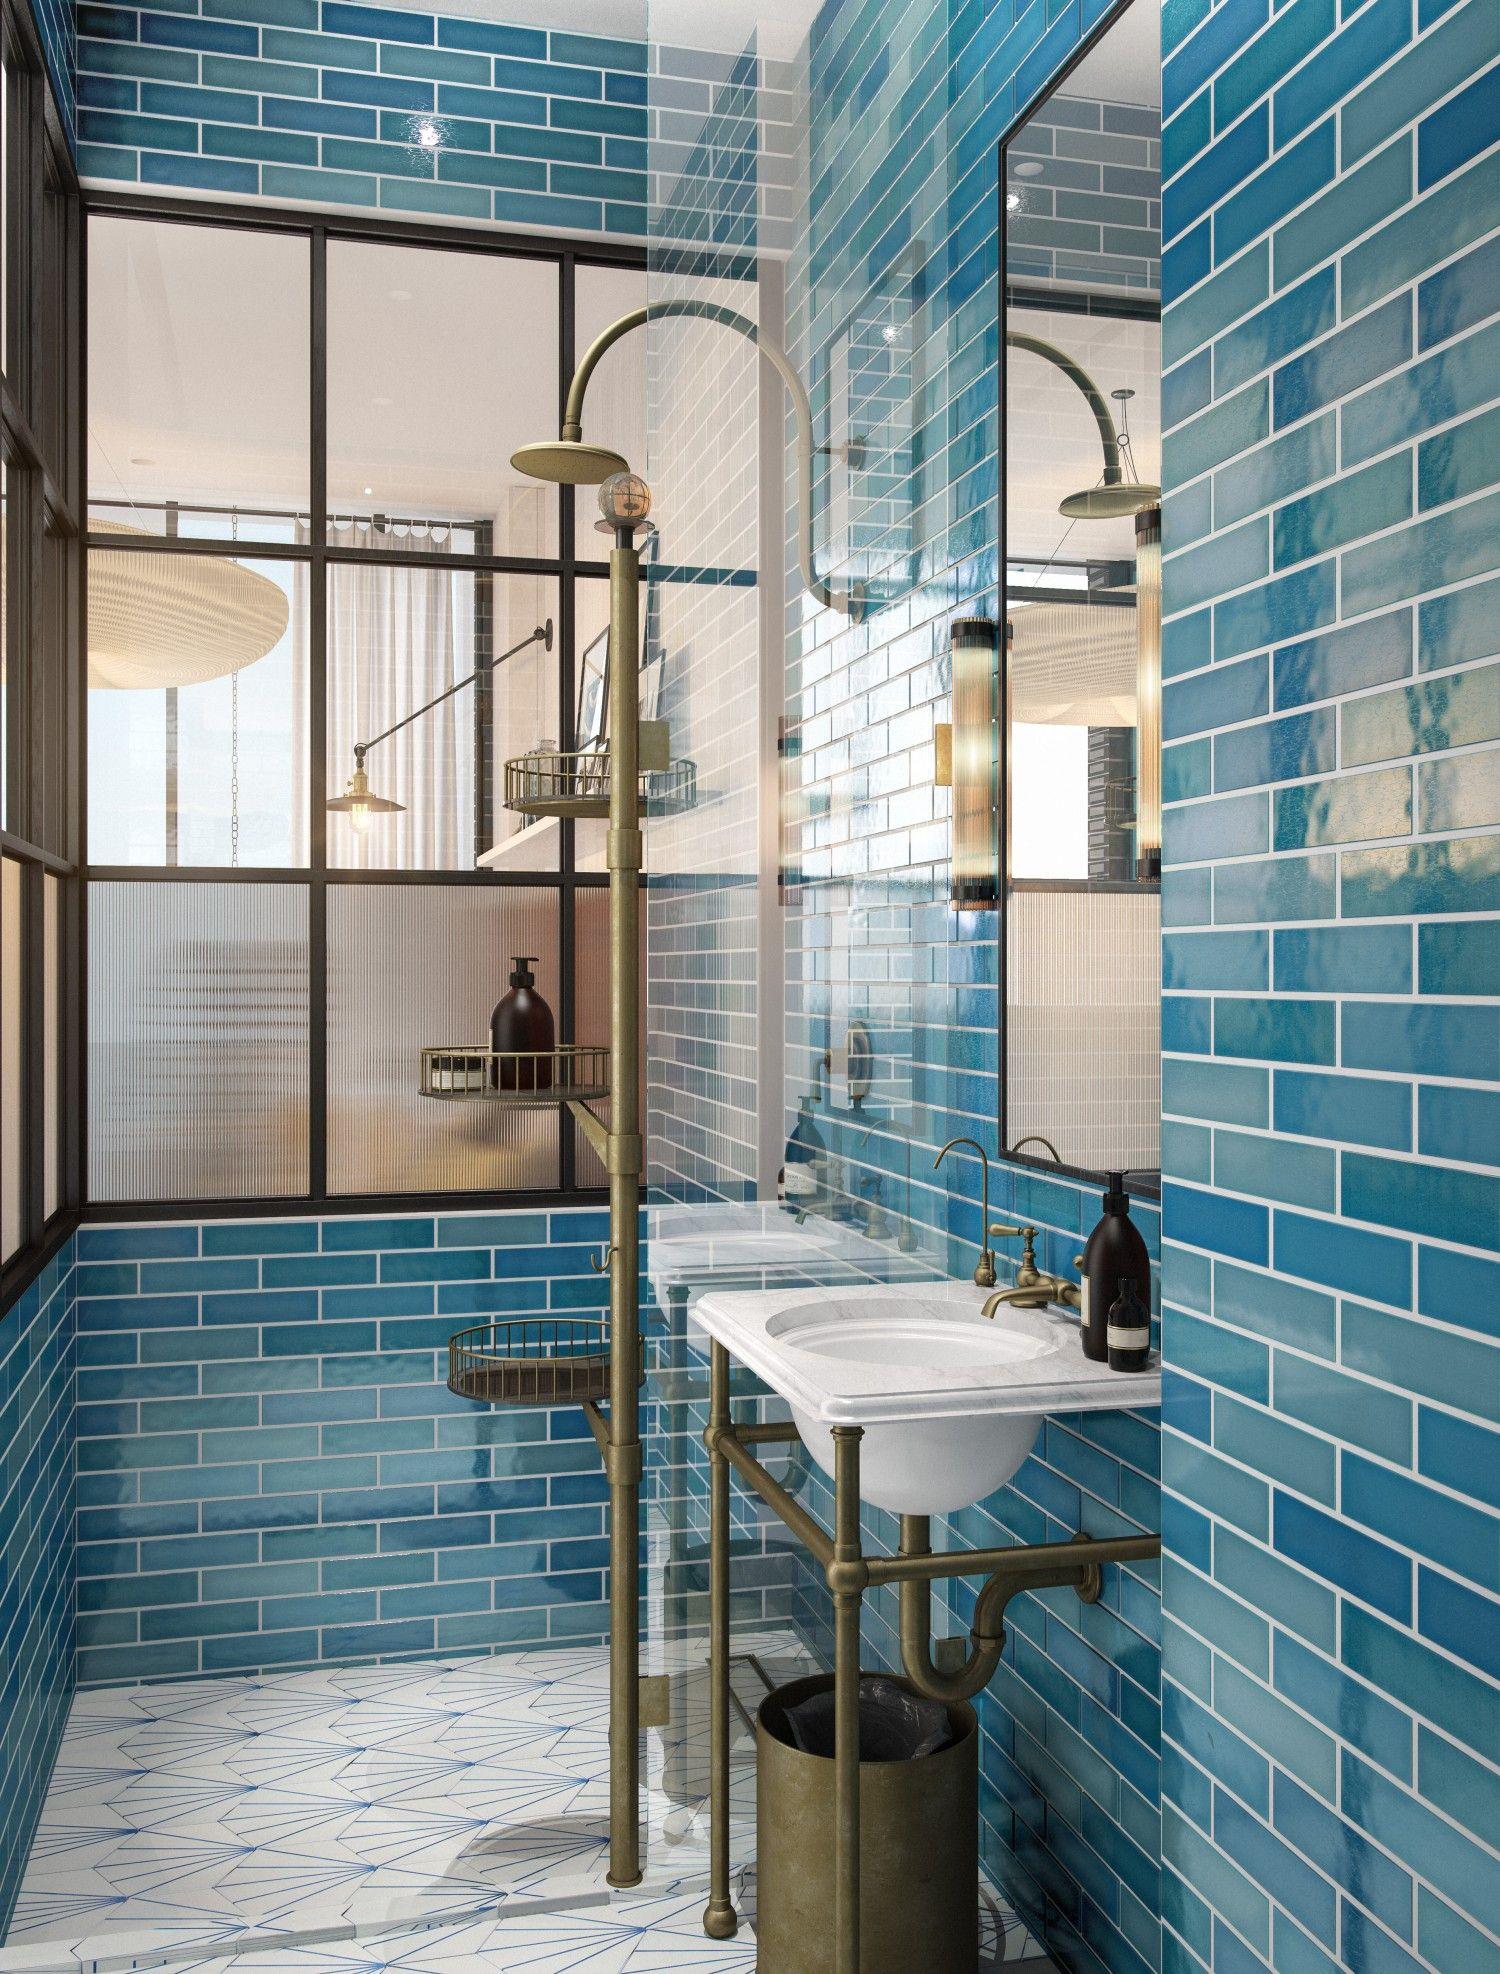 Williamsburg Hotel Brooklyn Blue Lava Tiles By Pyrolave Uk